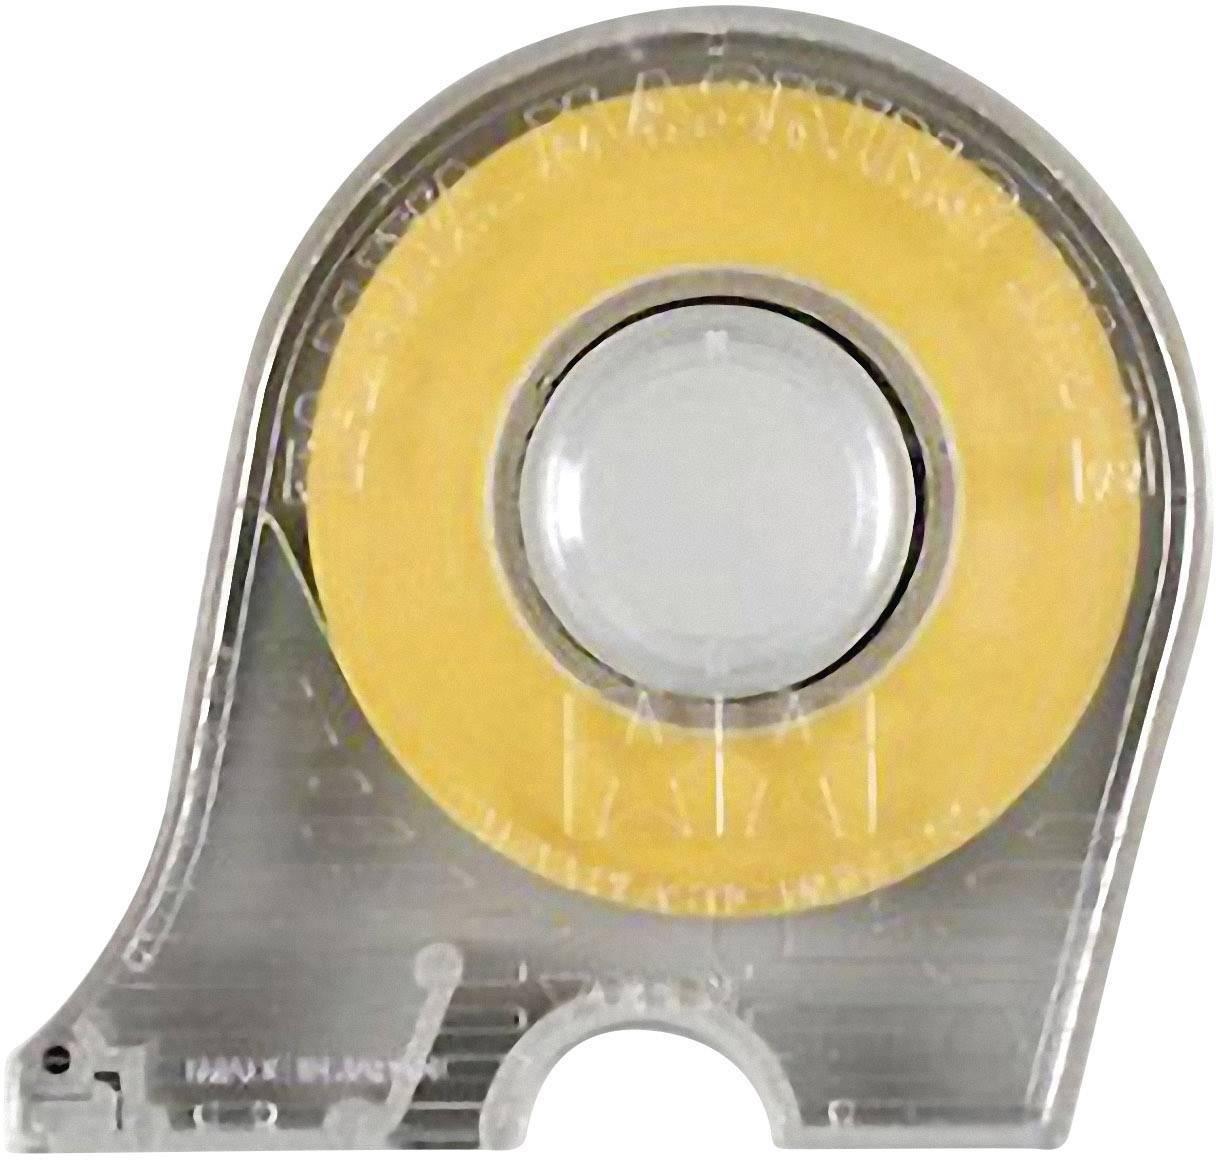 Airbrush maskovací páska Tamiya, 18 mm x 18 m